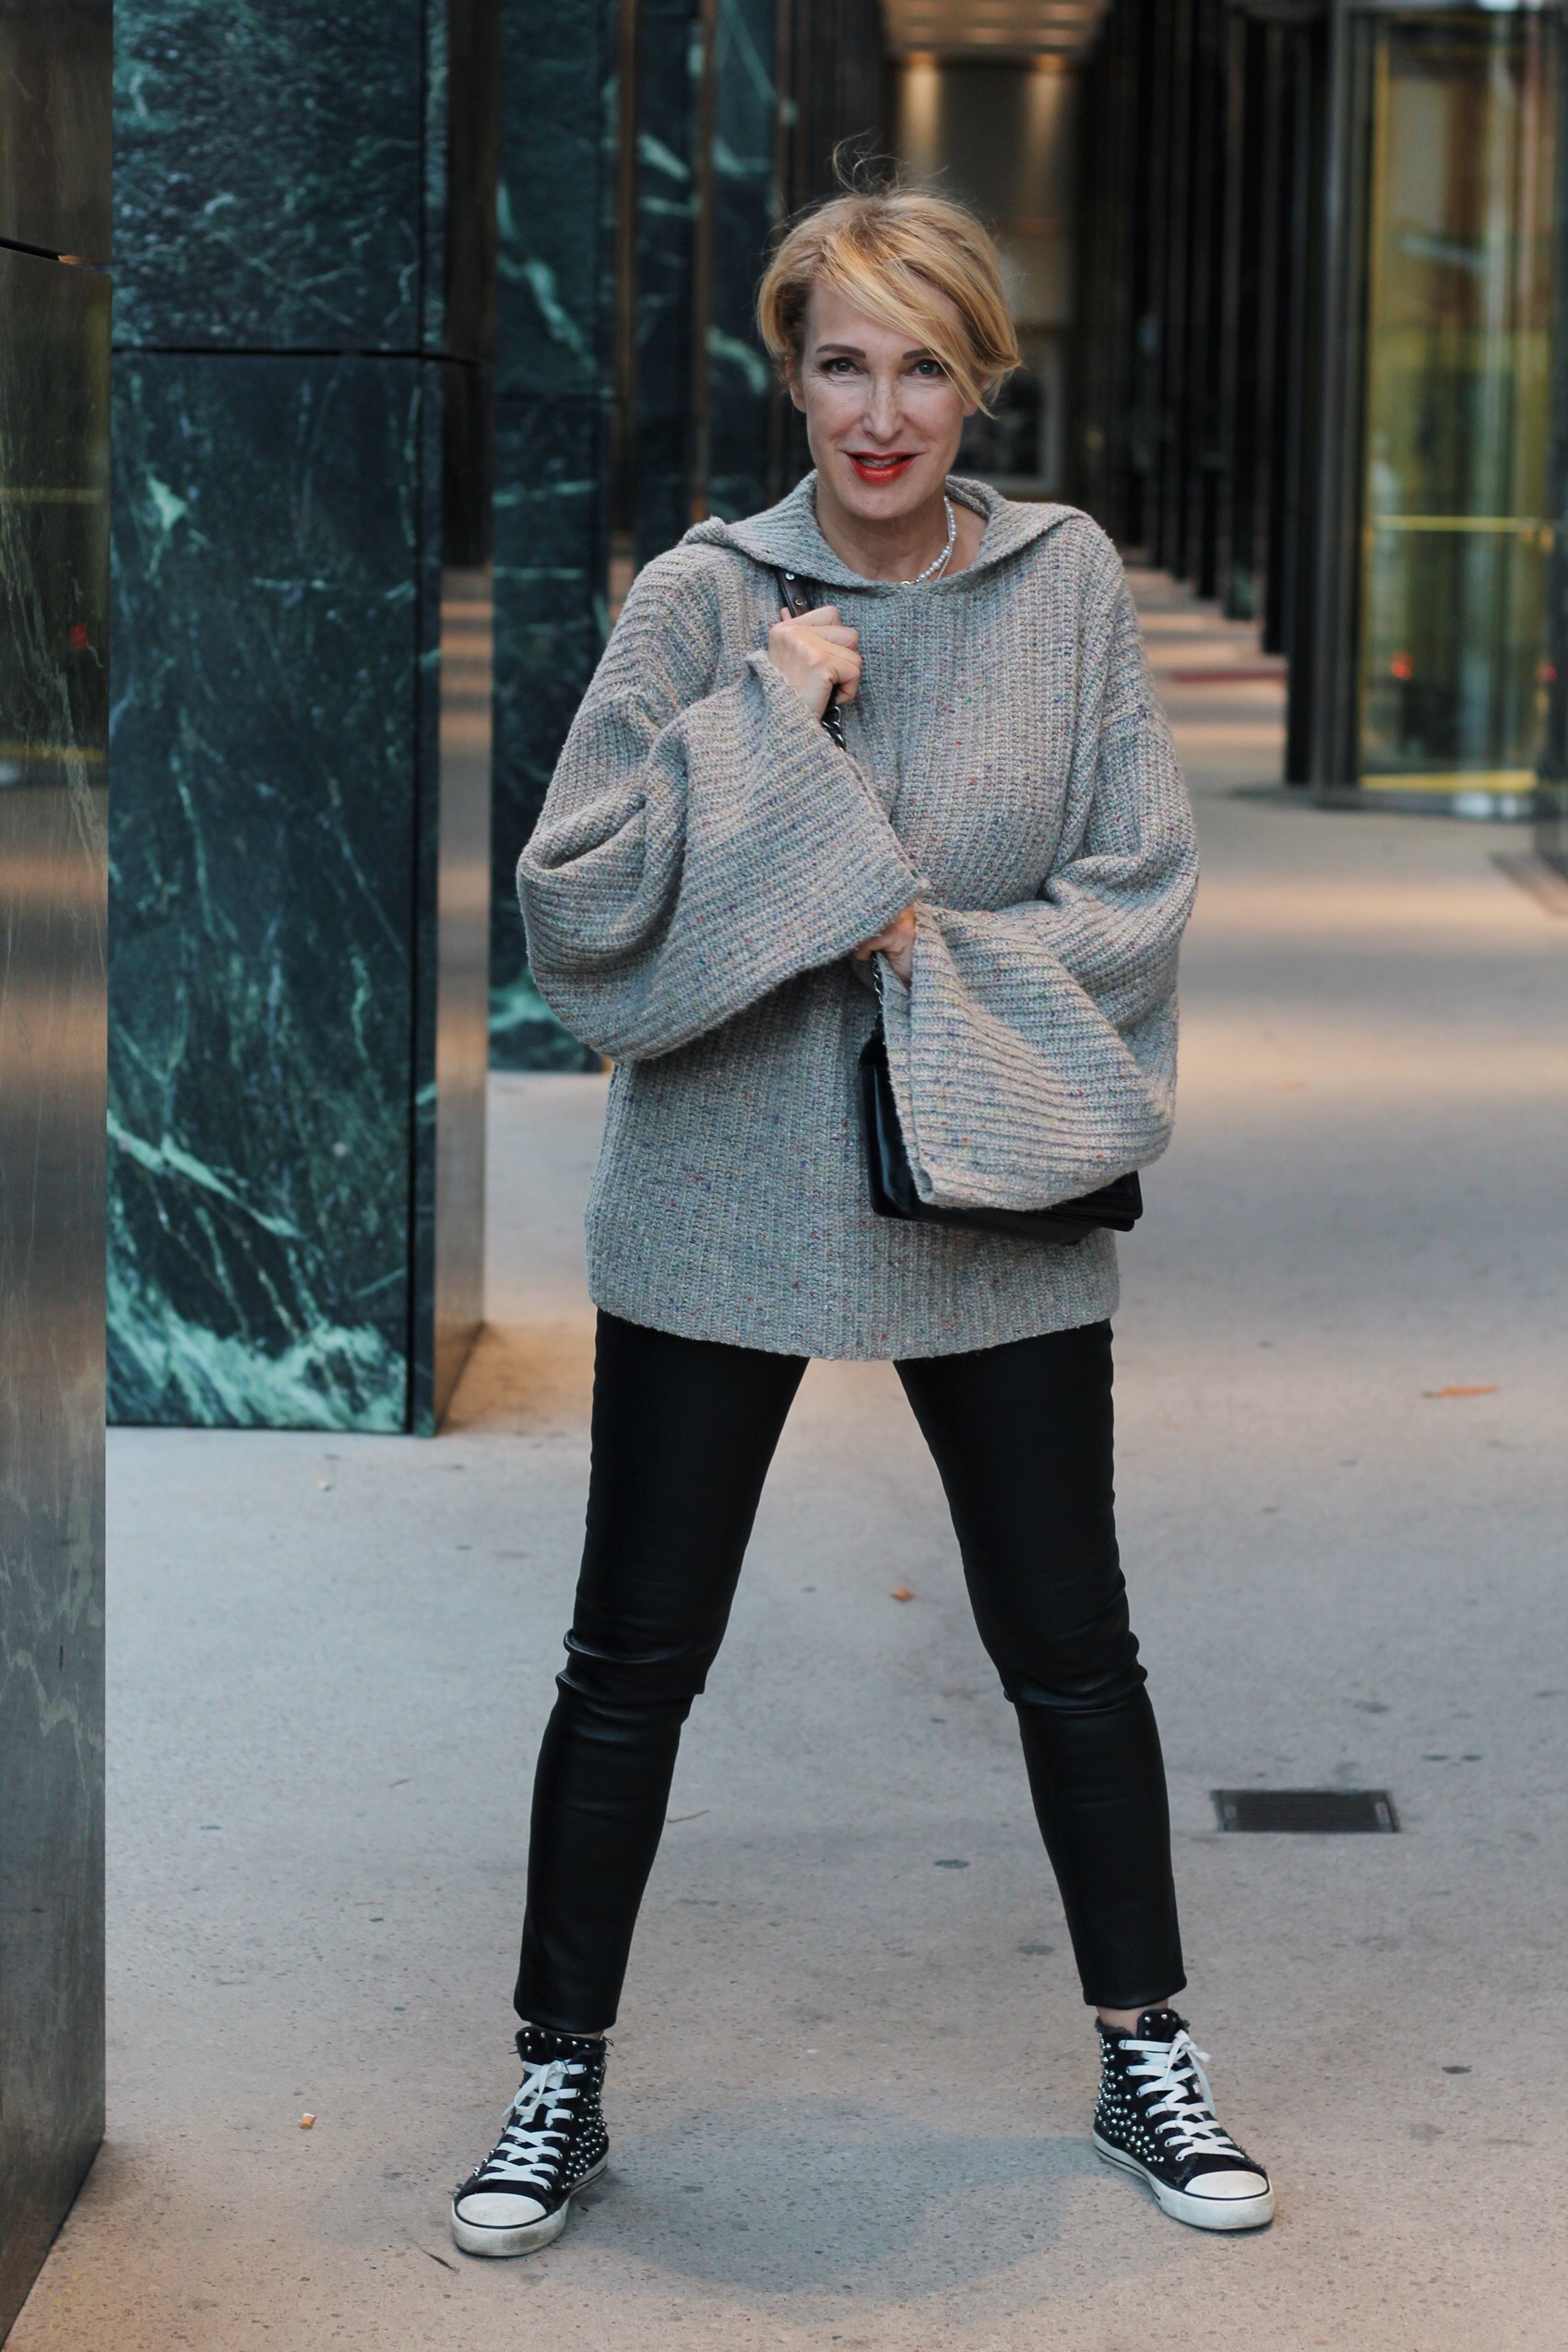 glamupyourlifestyle pullover Pullis Herbst-Outfit Herbst-Trends ü-40-blog ü-50-blog ue-40-blog ue-50-mode